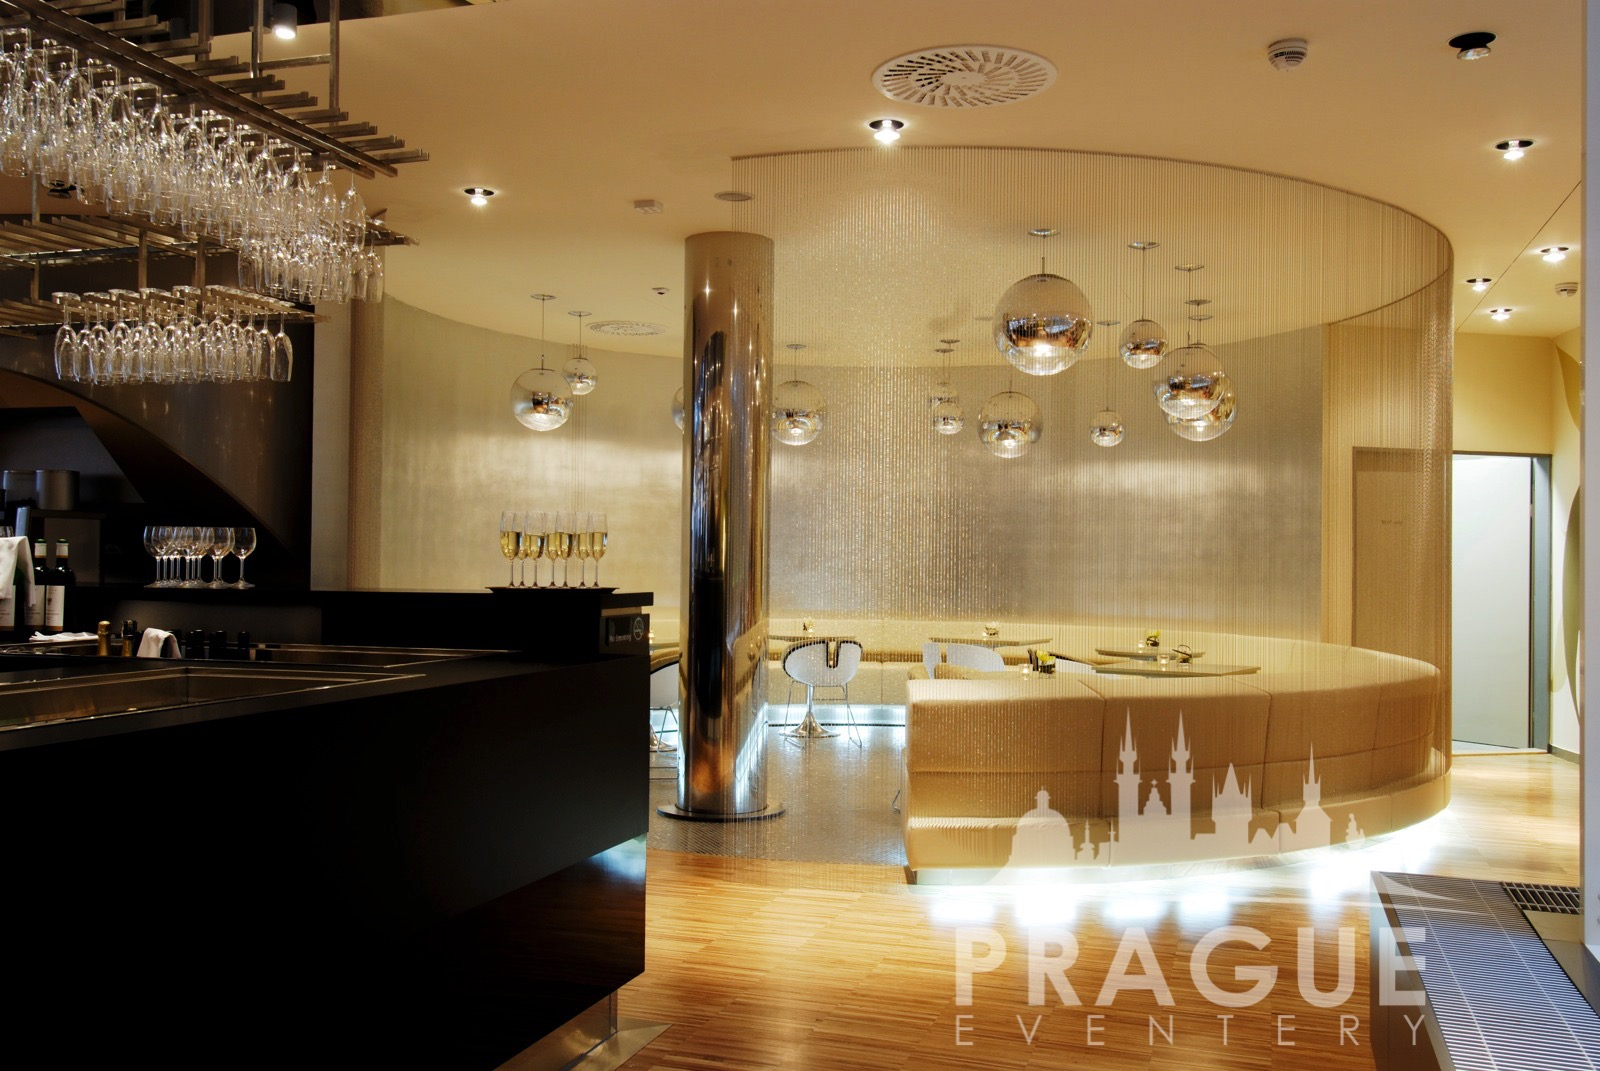 Yasmin hotel prague eventery trendy prague group hotel for Cool hotels prague